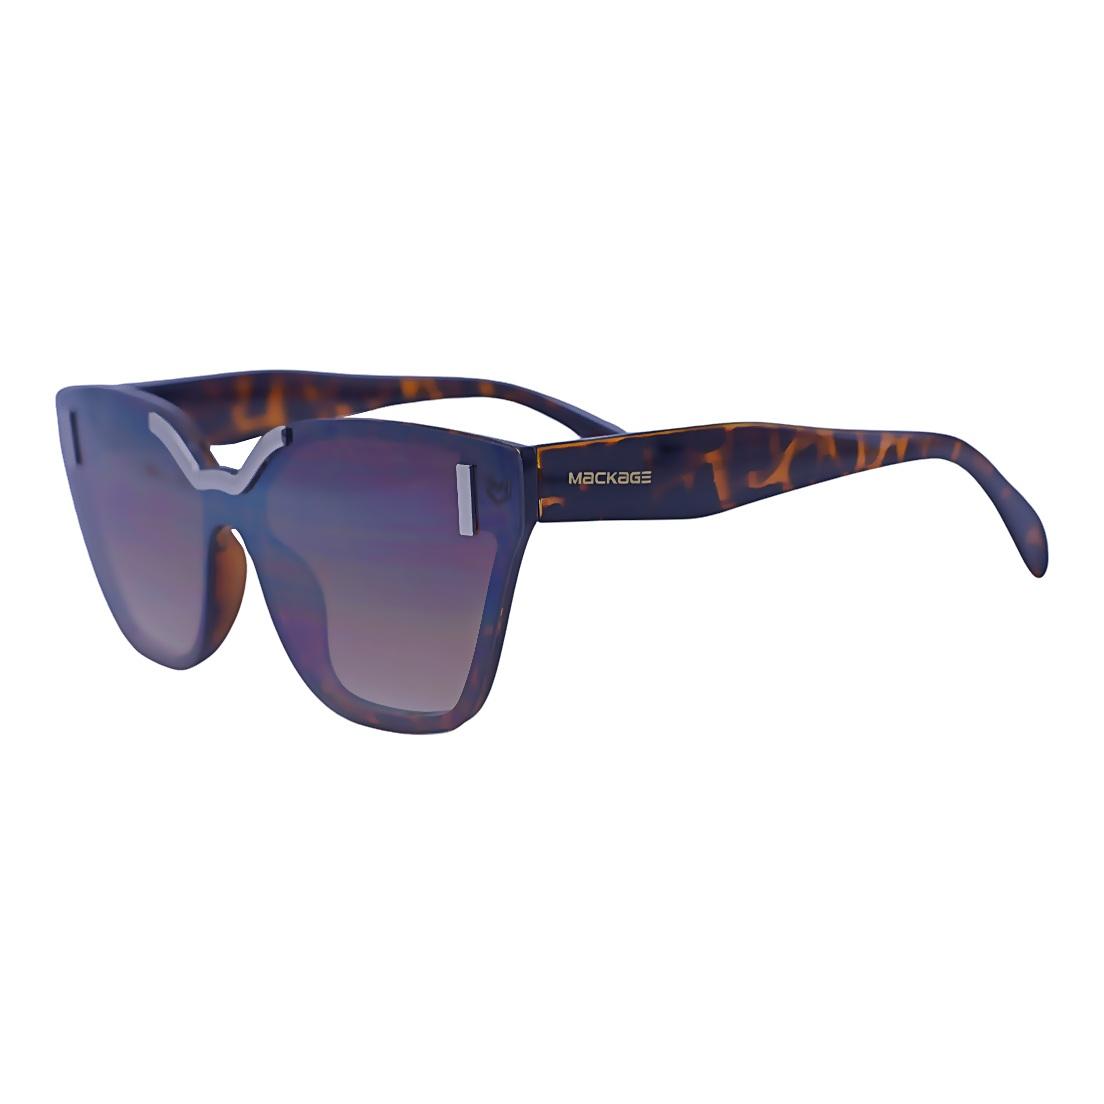 Óculos De Sol Mackage Feminino Acetato Mascara - Tartaruga